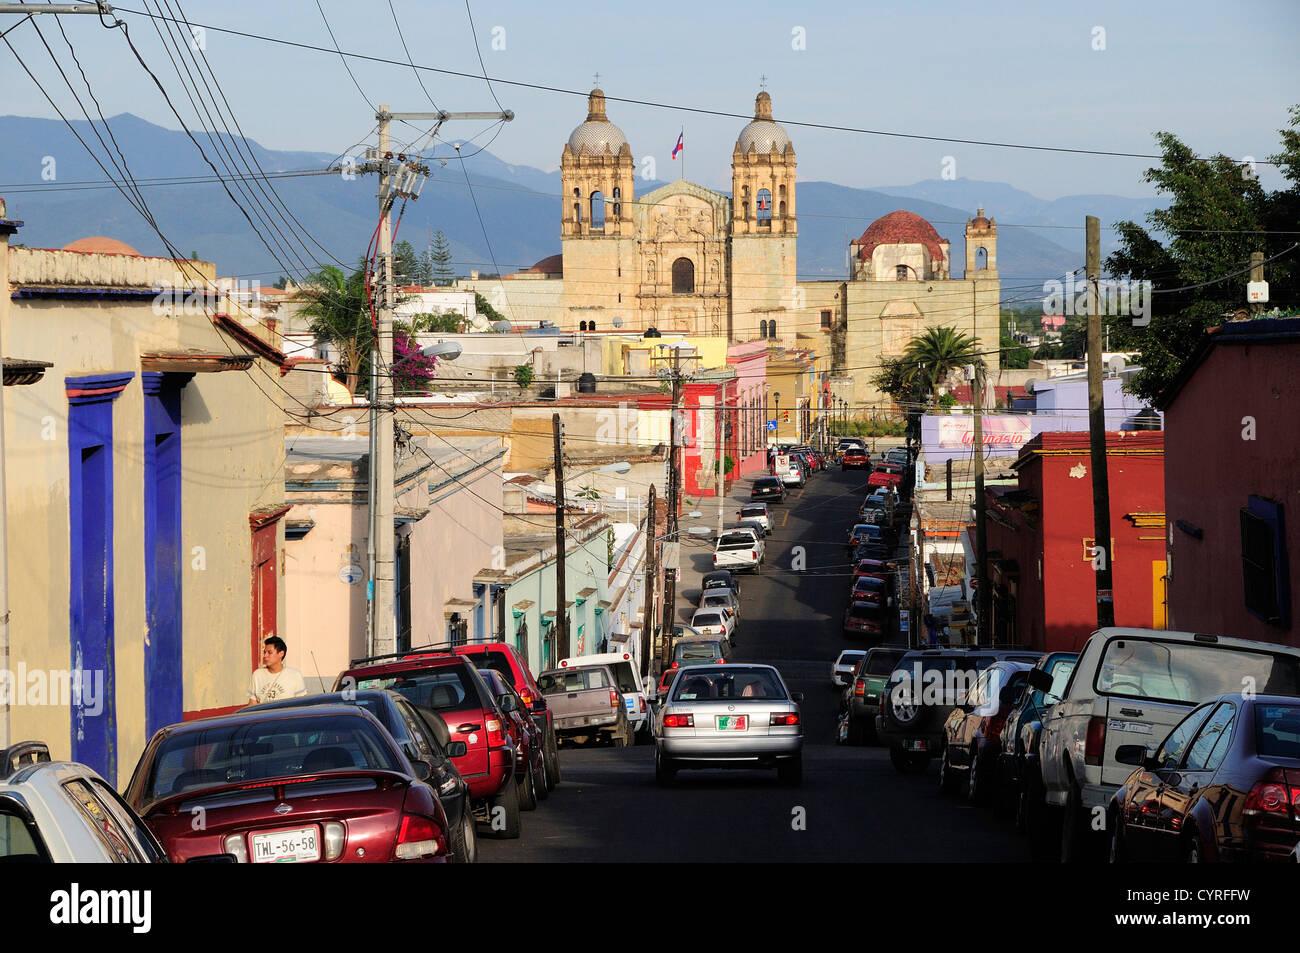 View along street lined by parked vehicles towards church of Santo Domingo American  Hispanic Latin America Latino - Stock Image